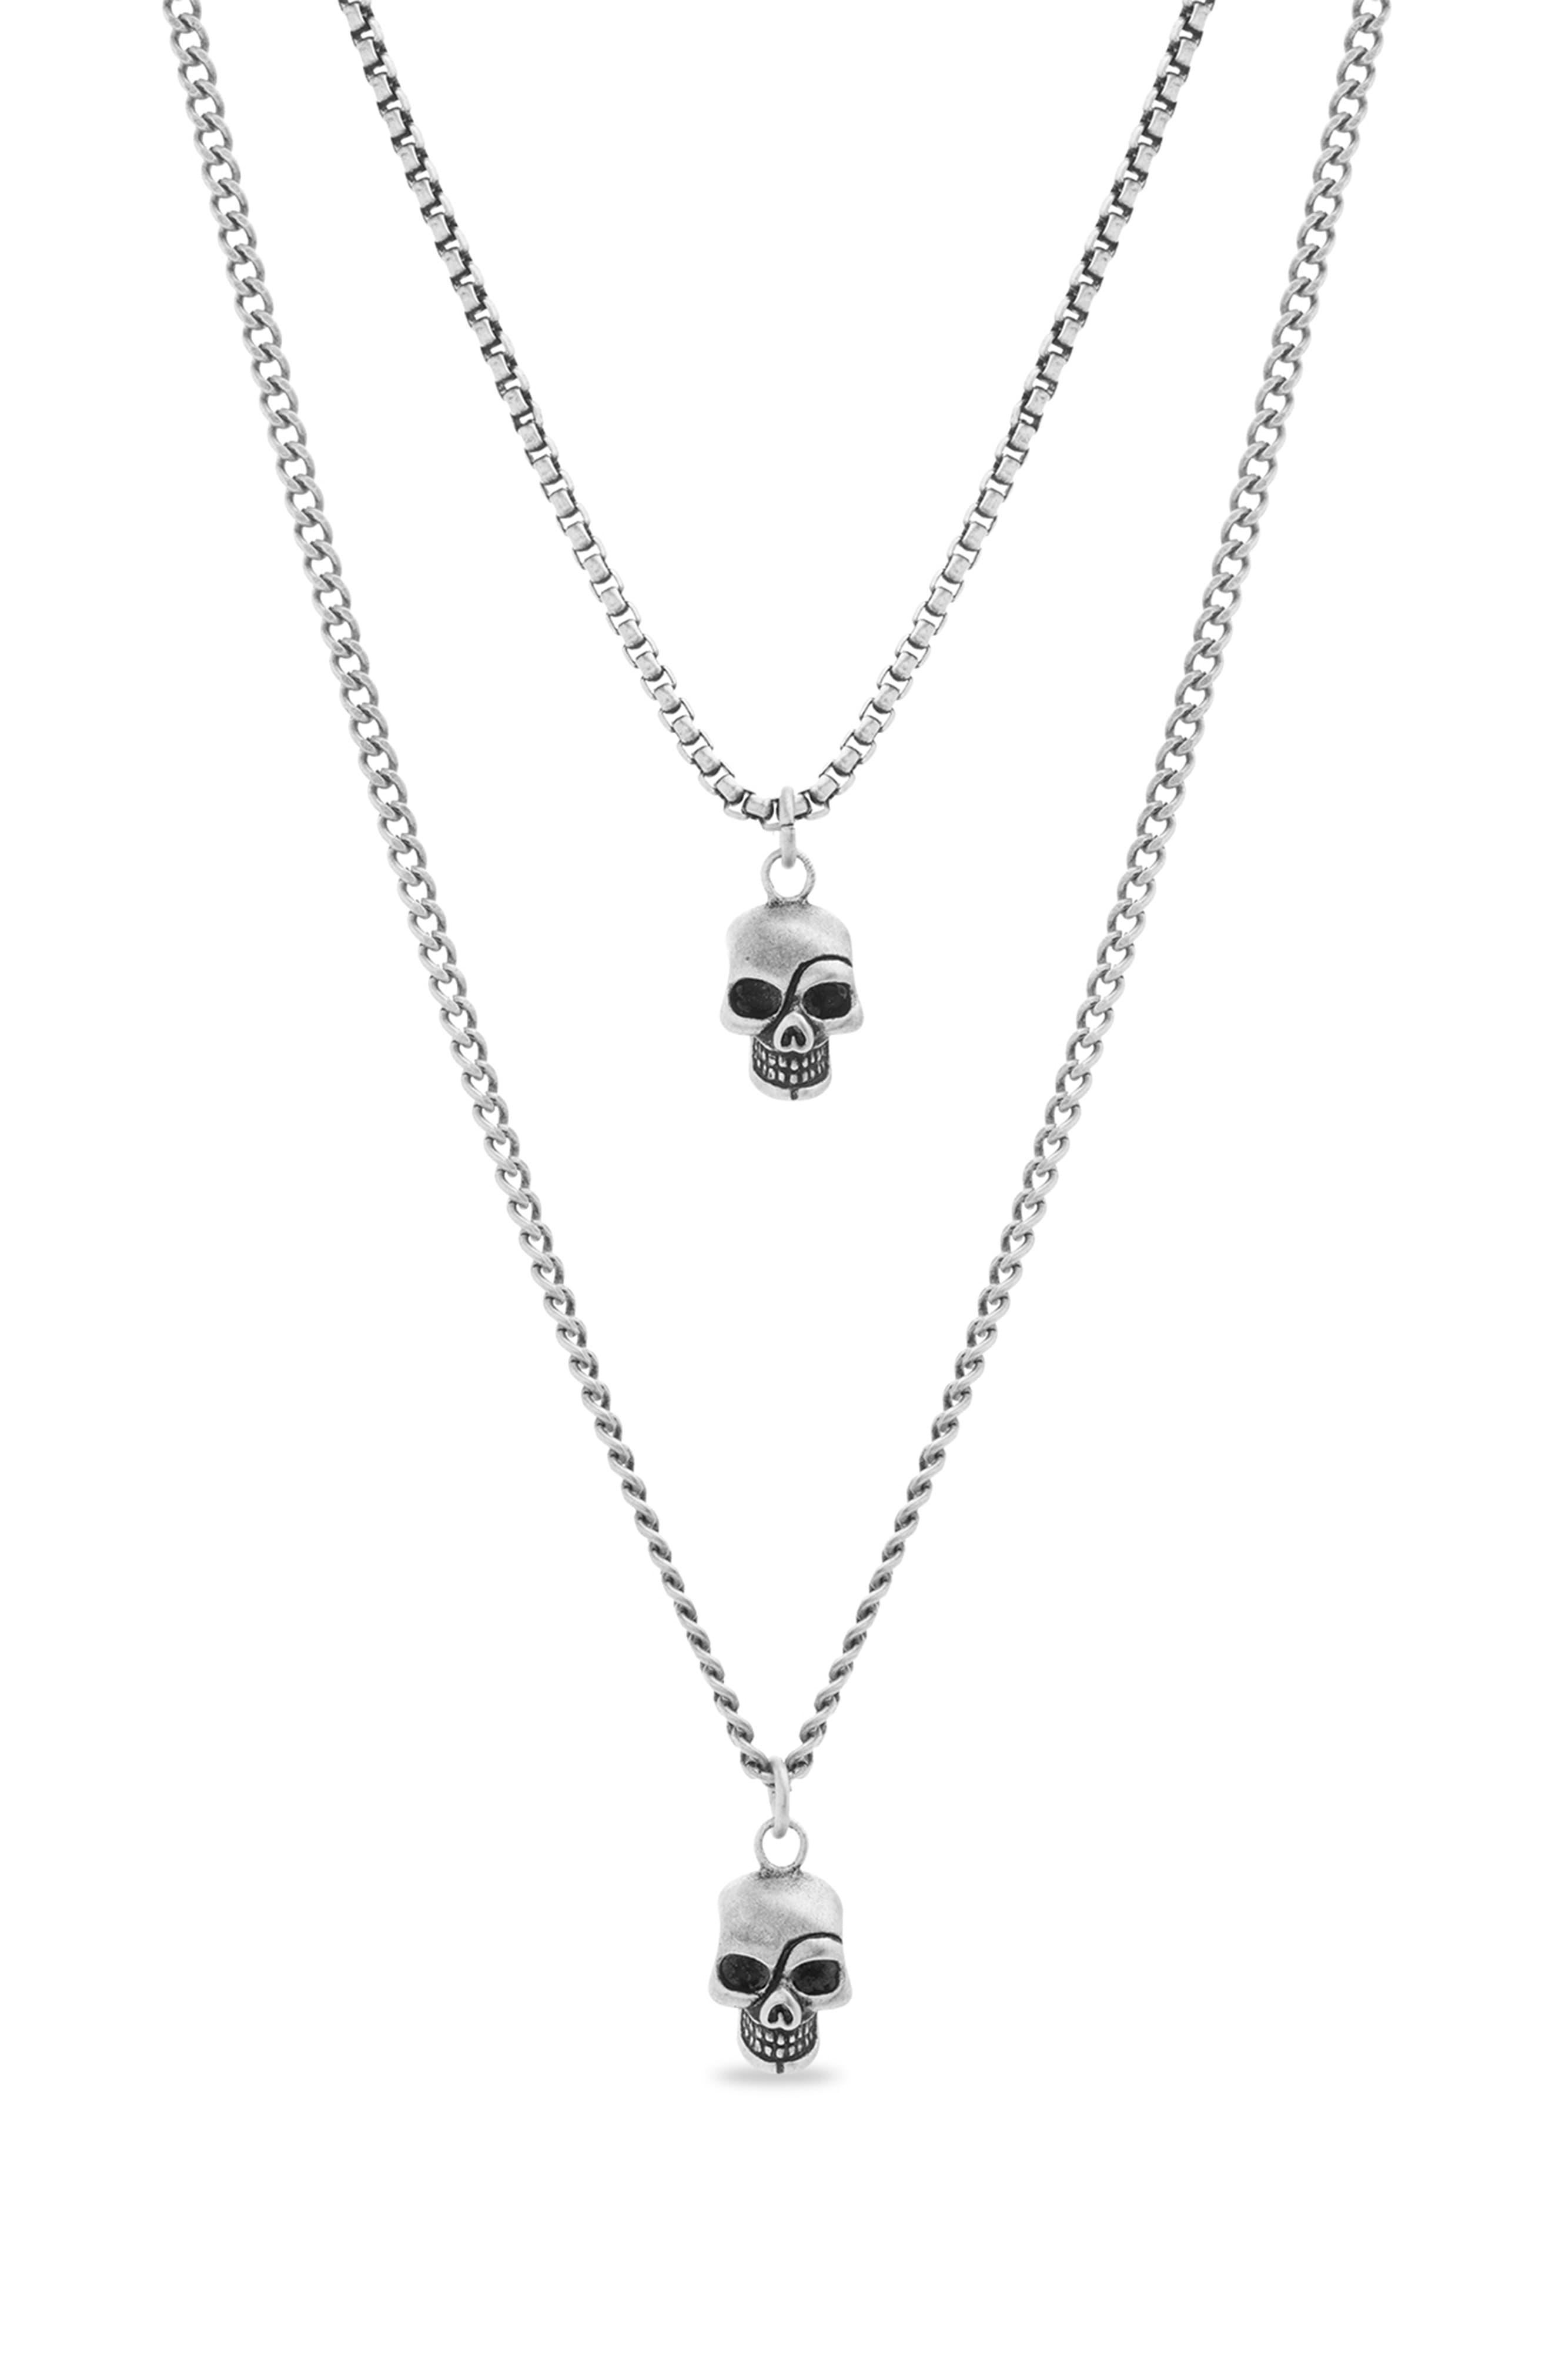 Steve Madden Skull Duo Pendant Necklace In Metallic Silver